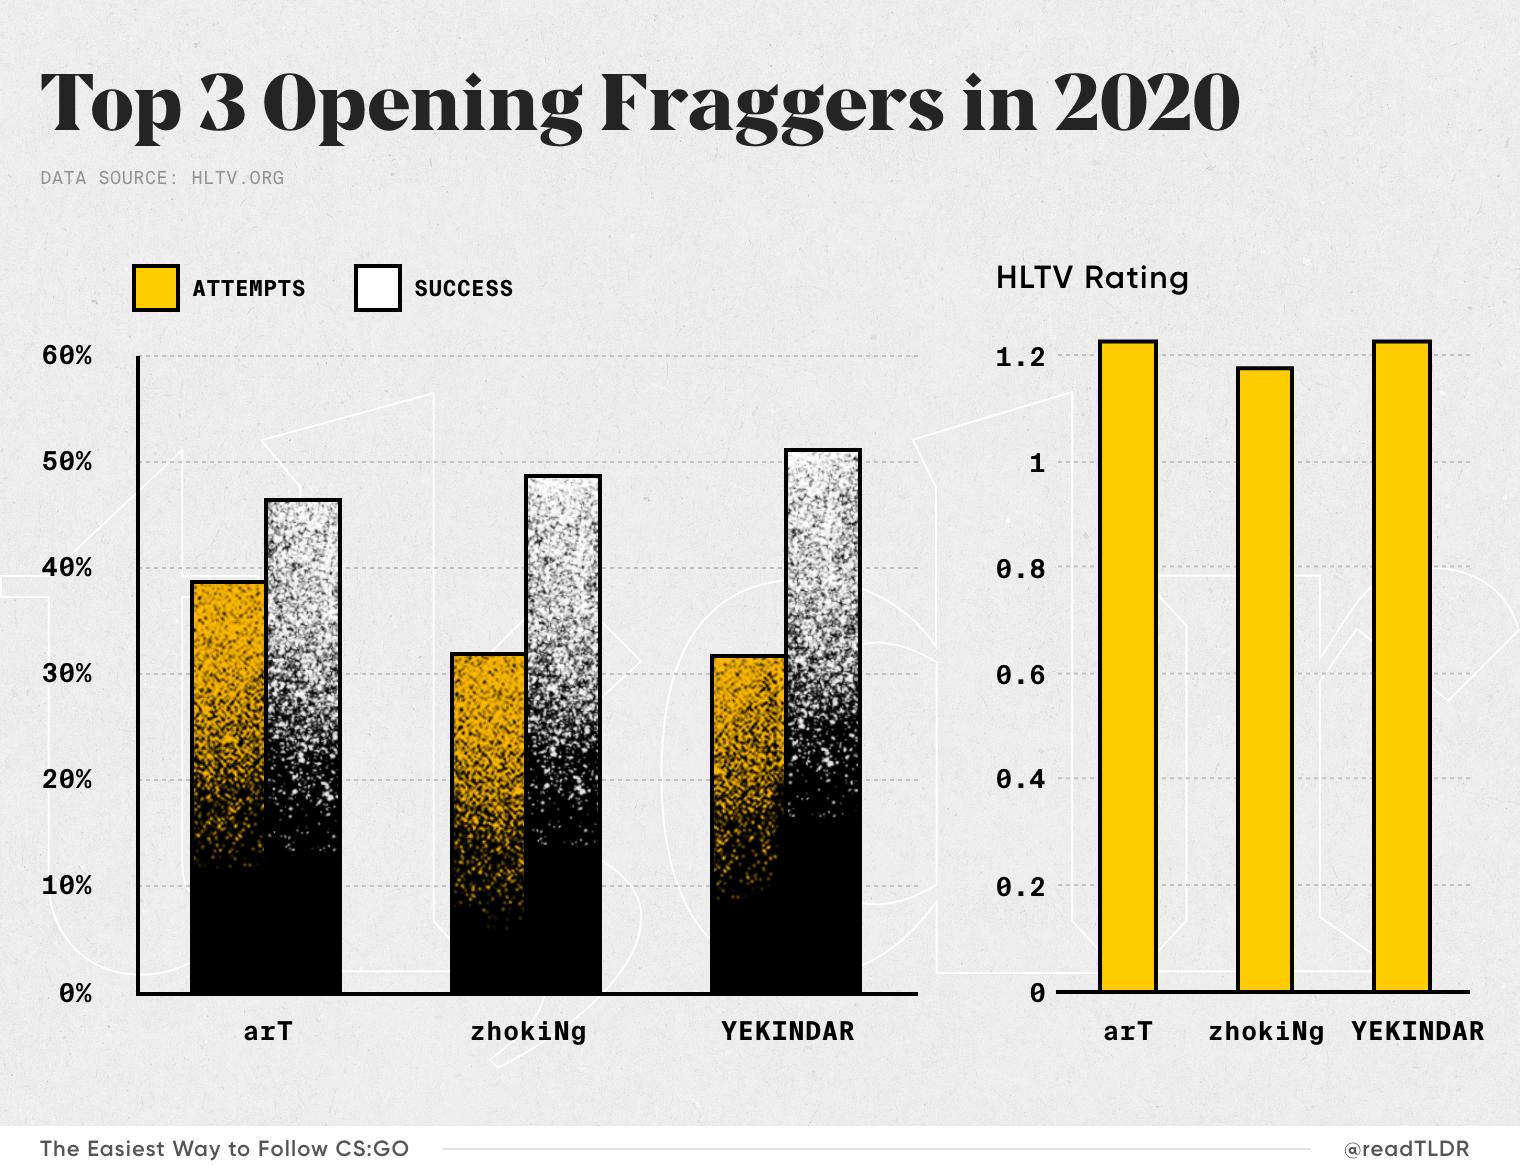 Top 3 Opening Fraggers in CS:GO 2020